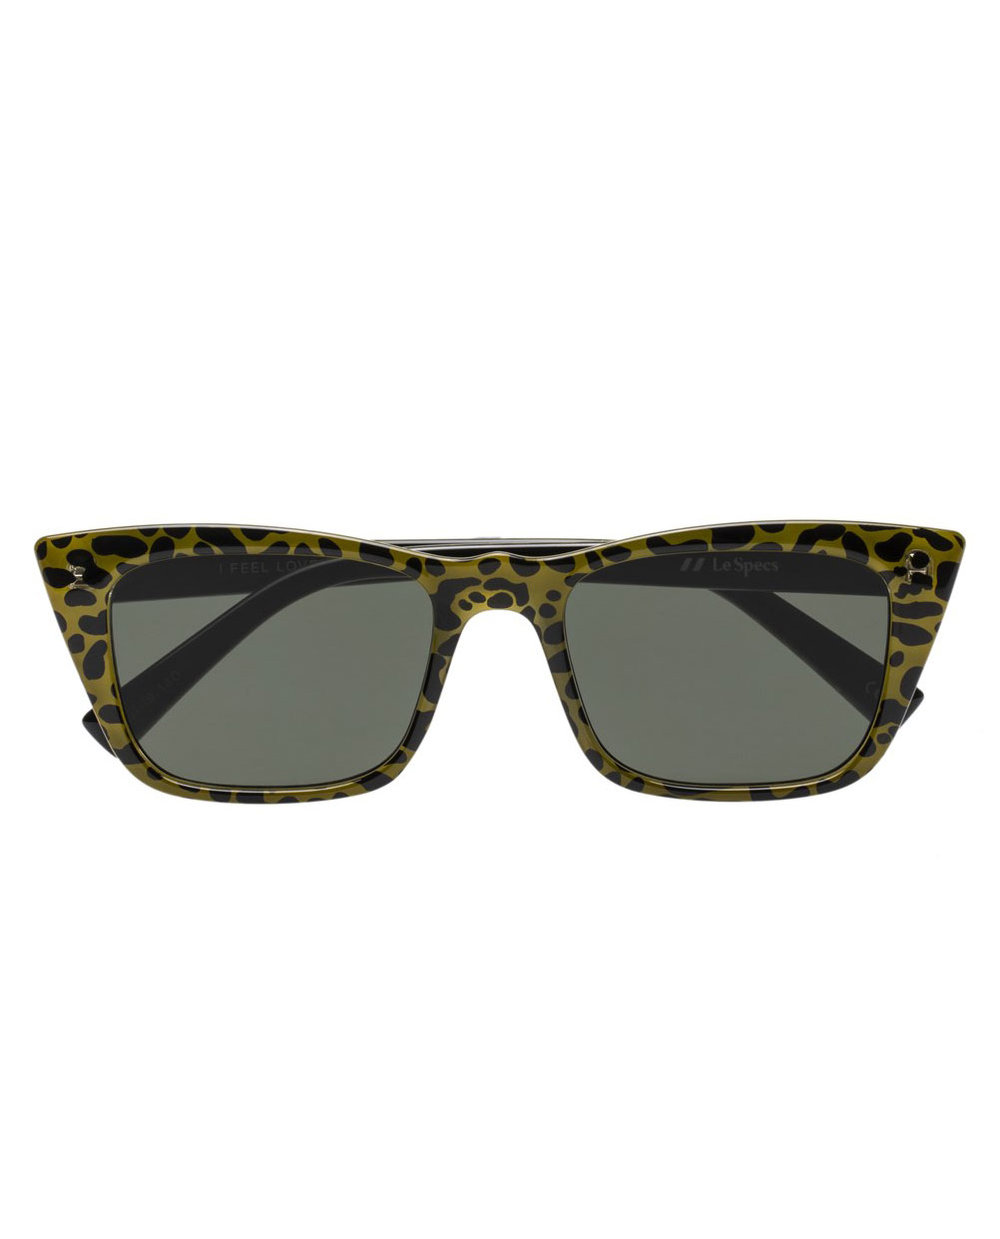 Le Spec Sunglasses     $59